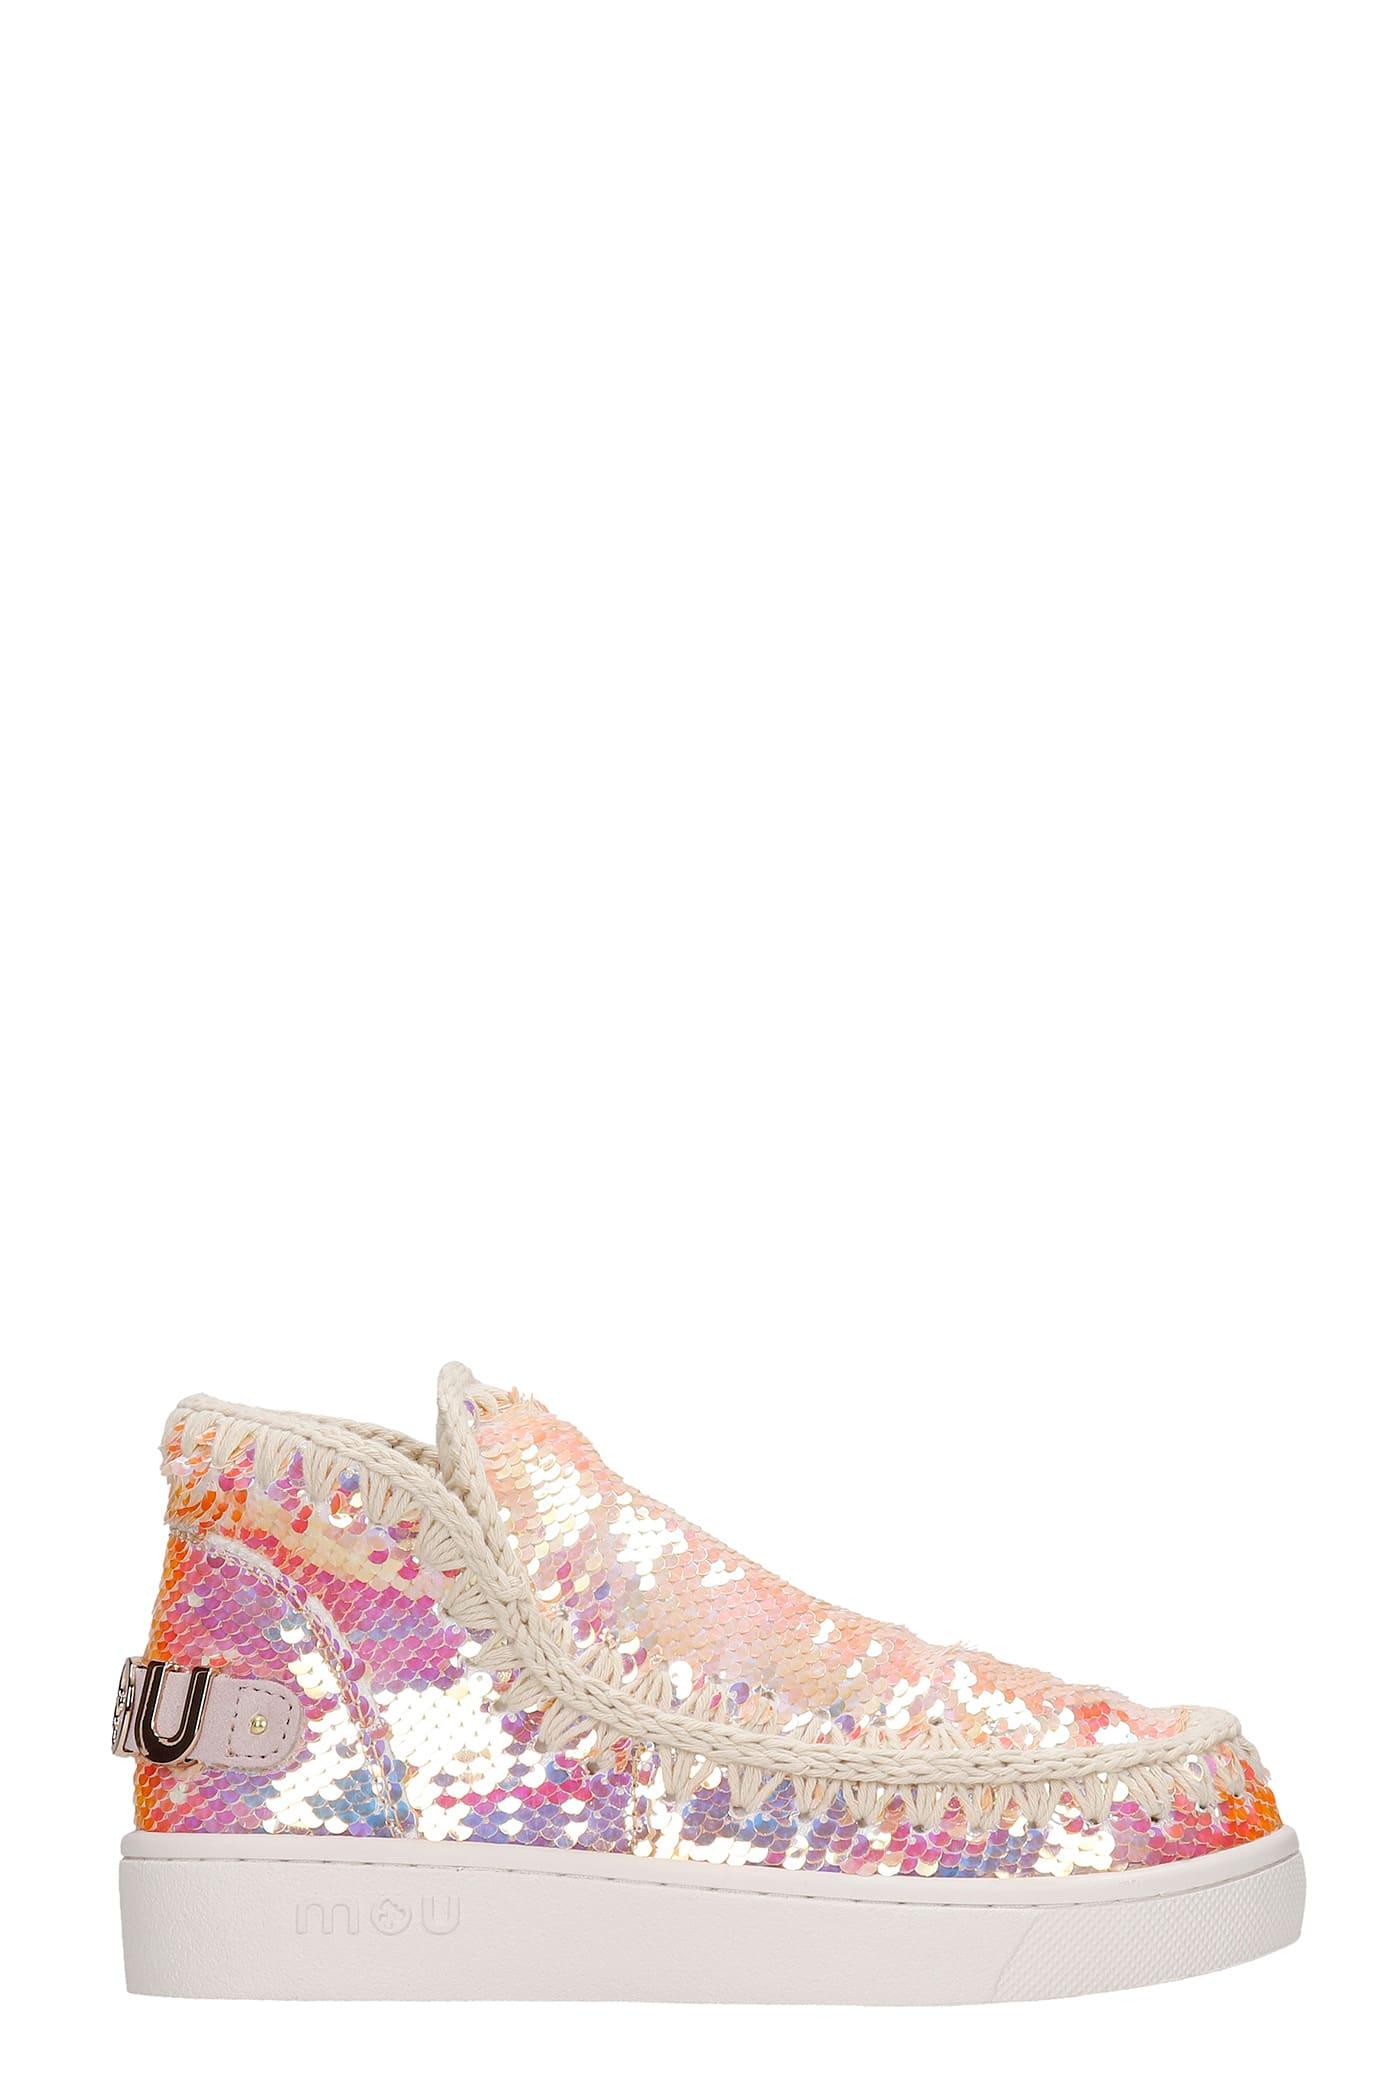 Mou Summer Eskimo Low Heels Ankle Boots In Beige Synthetic Fibers